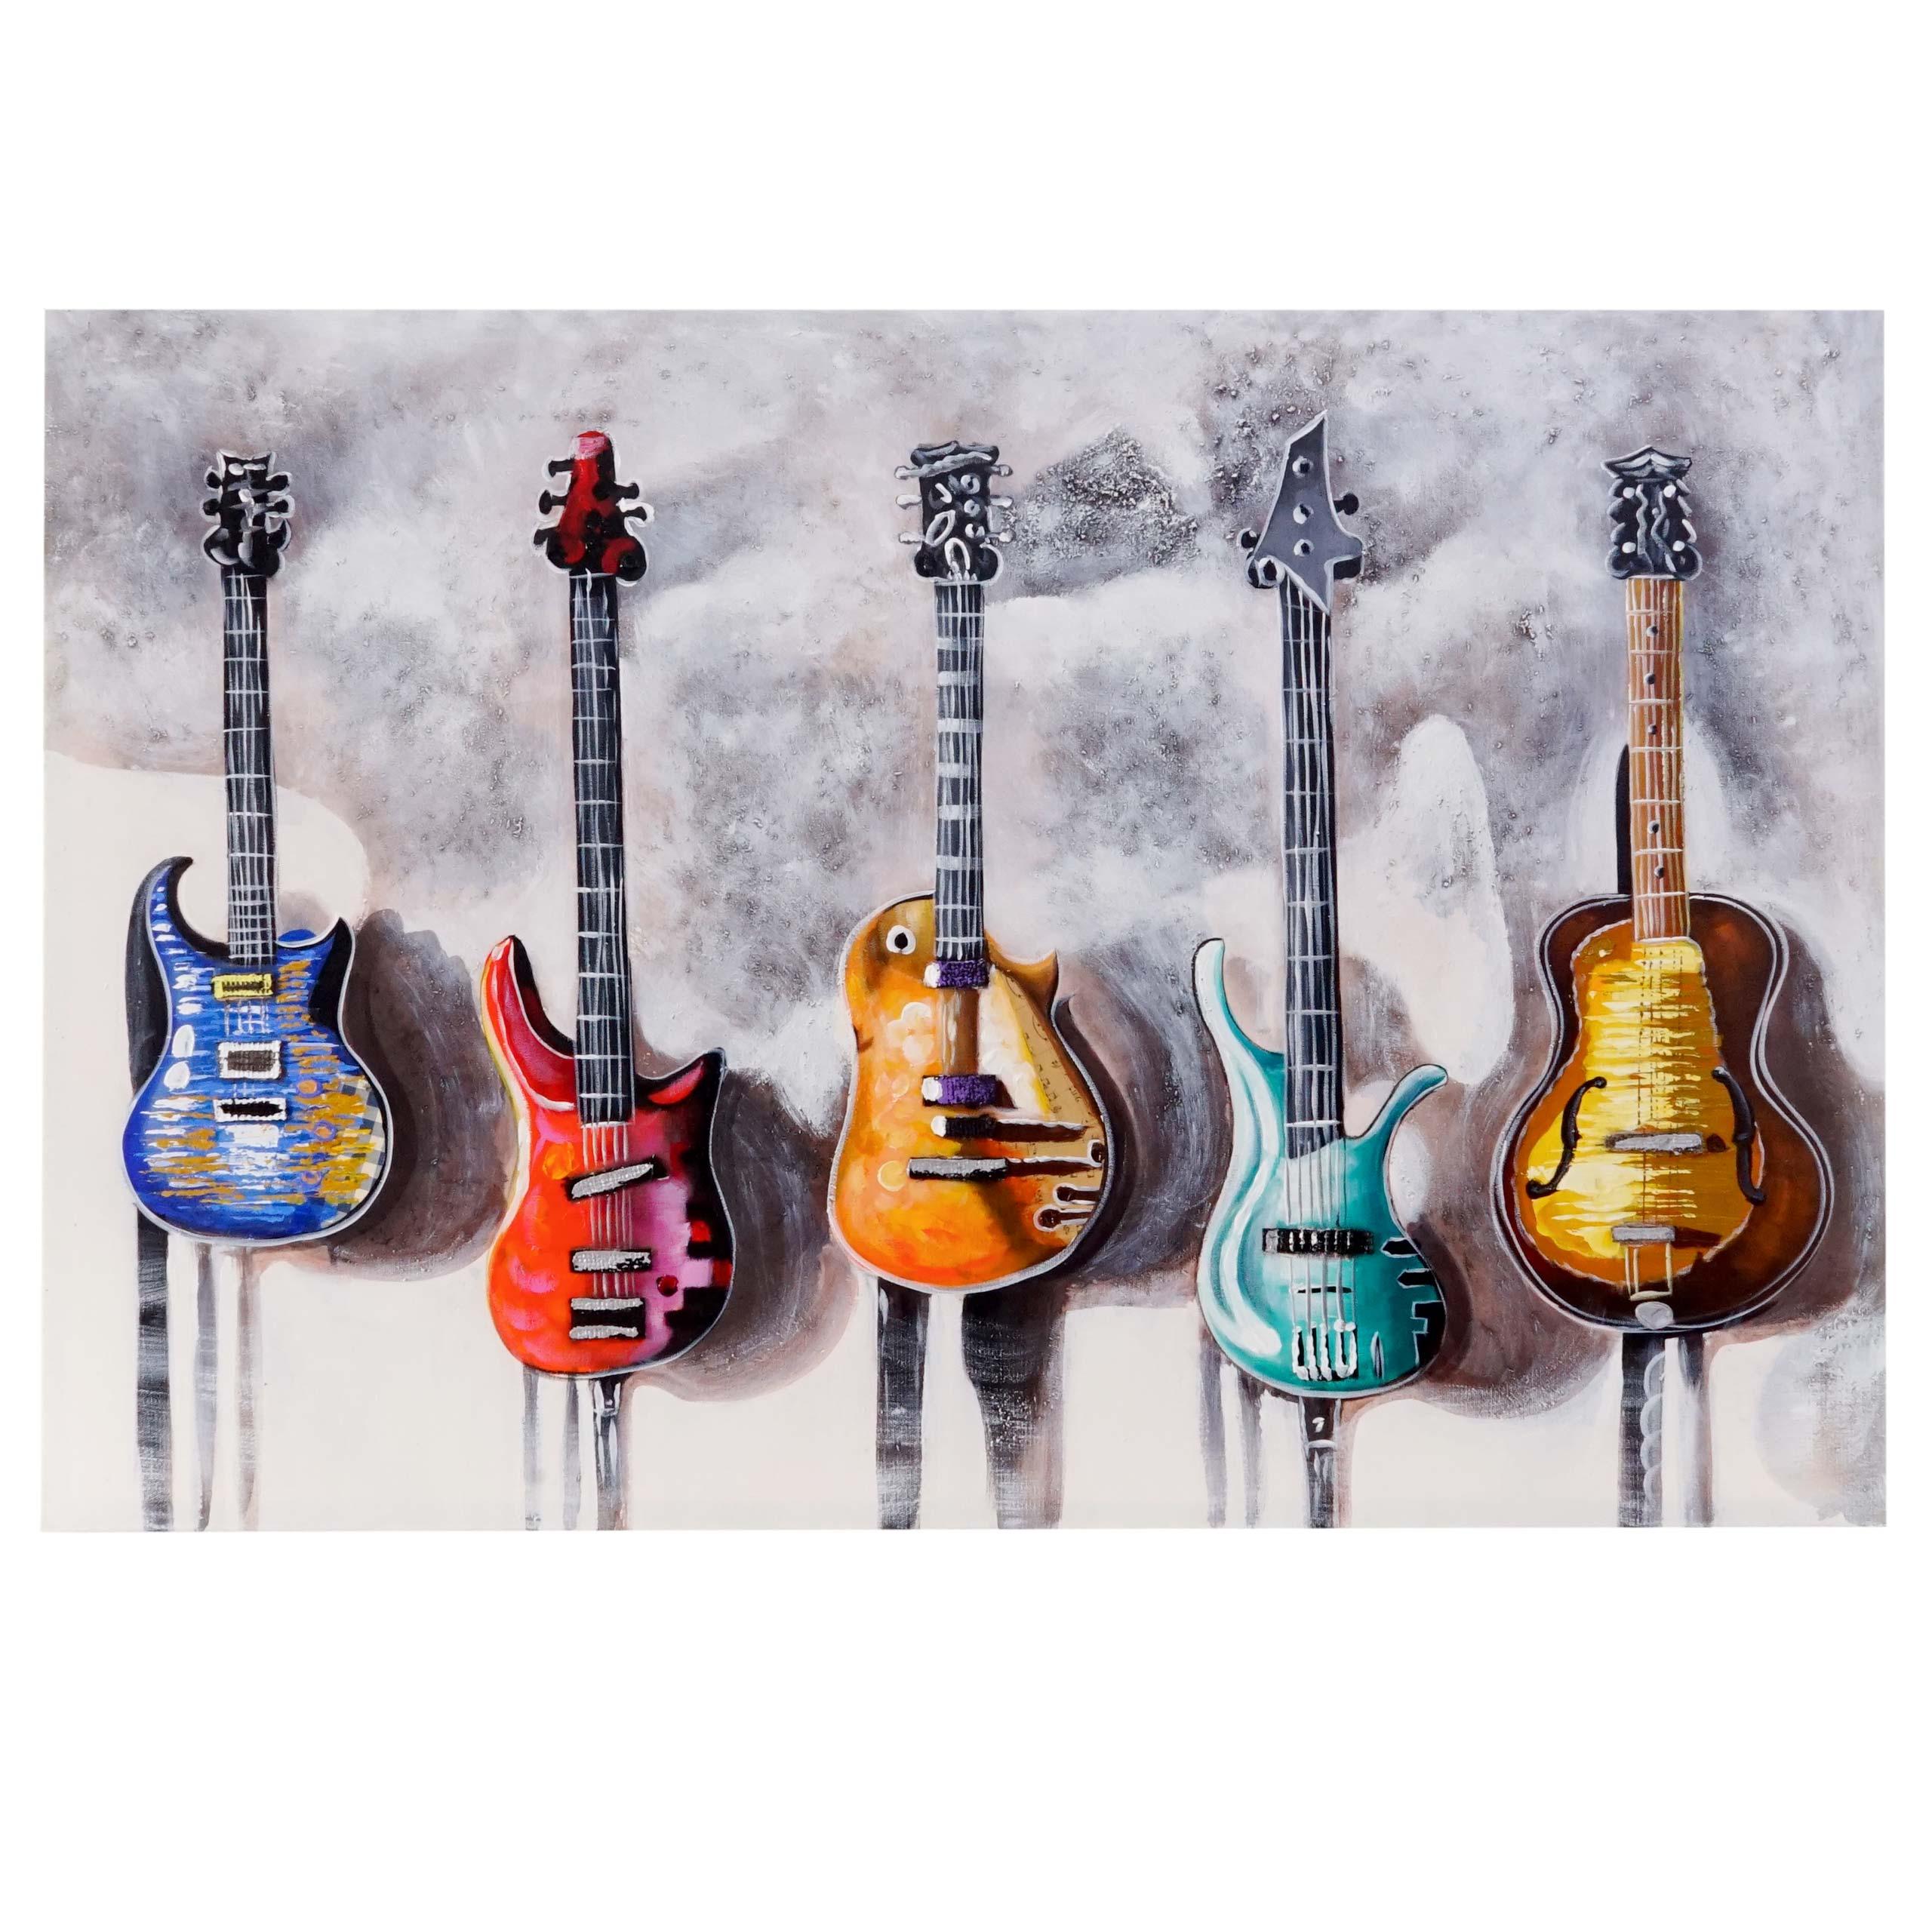 Mendler Ölgemälde Gitarren, 100% handgemaltes Wandbild 3D-Bild Gemälde XL, 120x80cm ~ Variantenangebot 44731